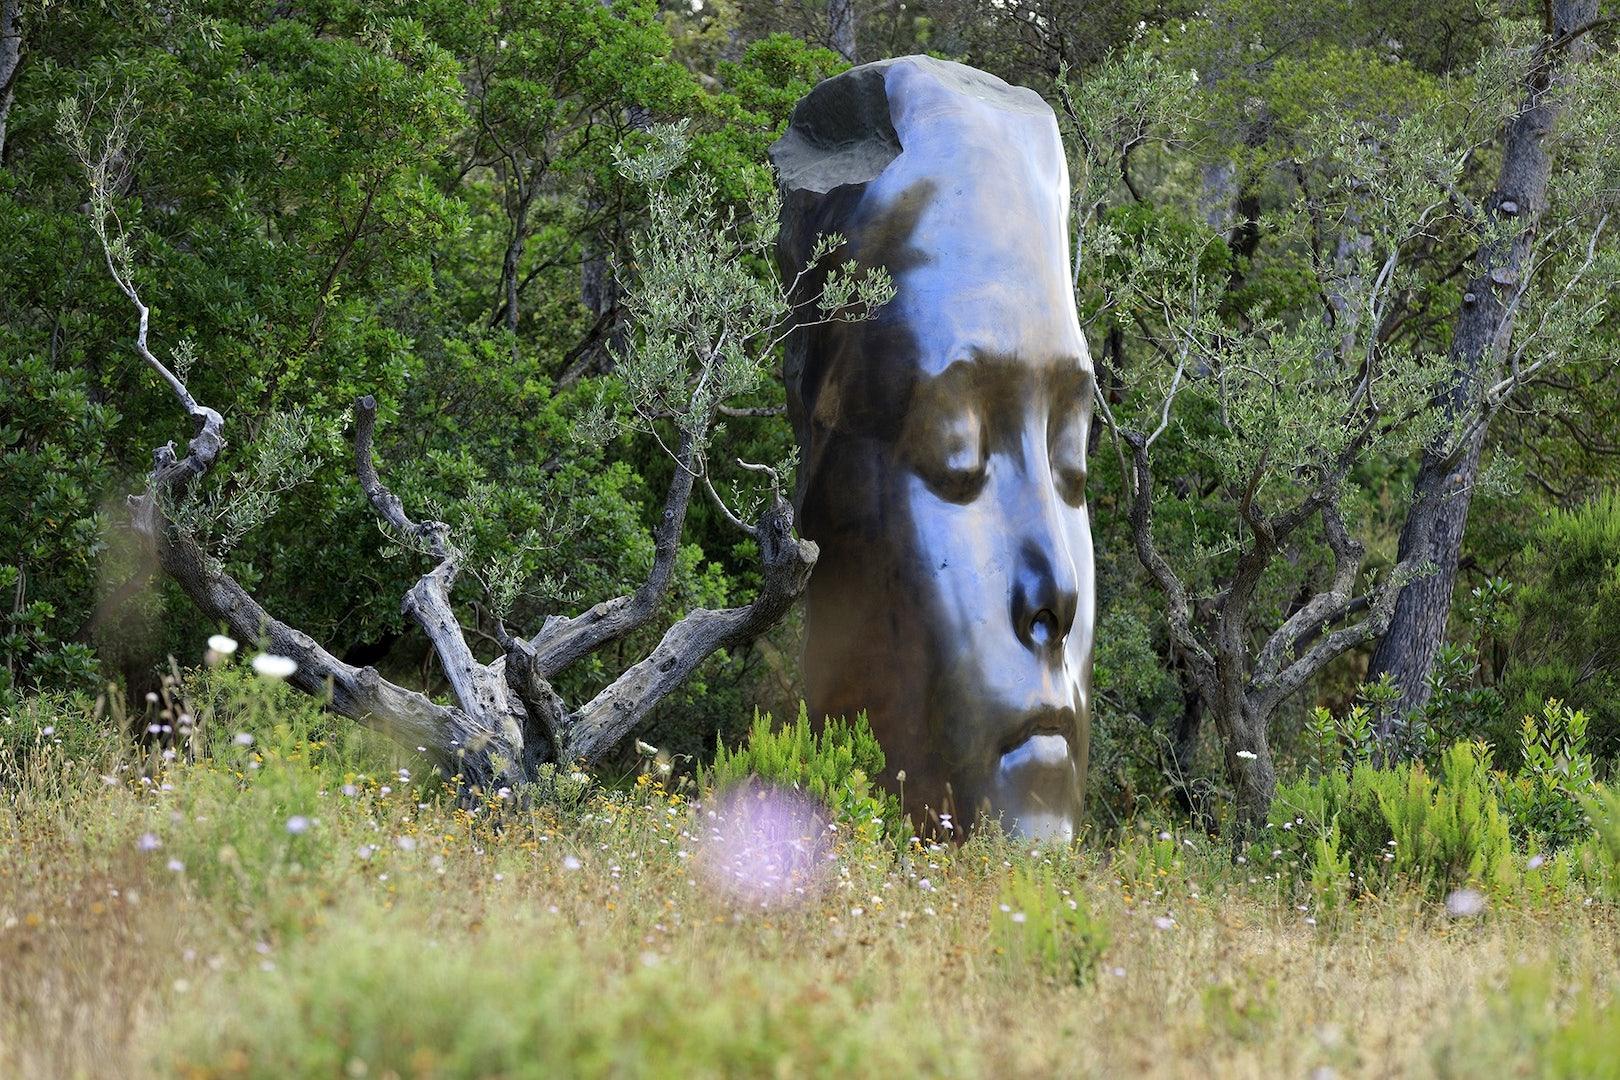 sculpture in the garden of the Villa Carmignac